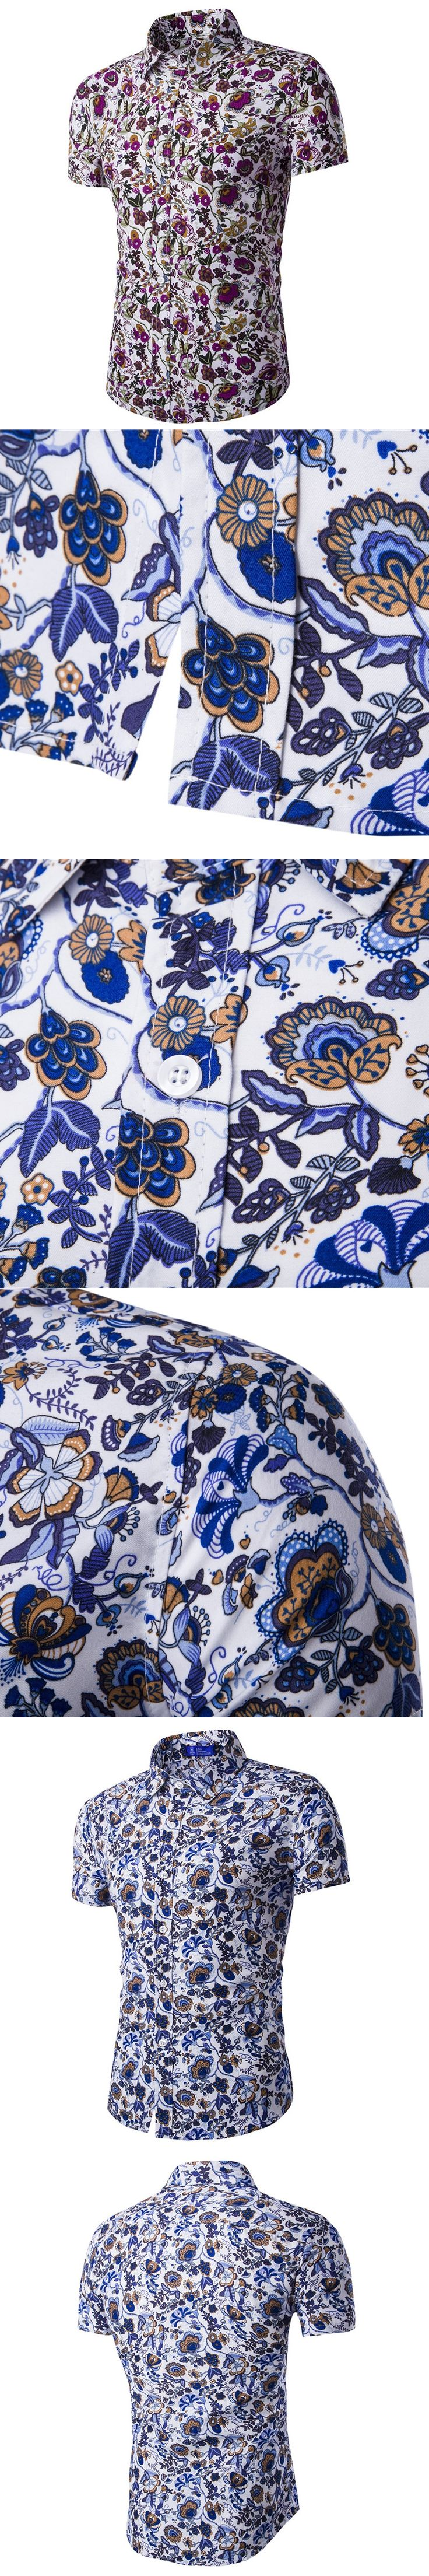 Fashion Mens Hawaiian Shirts Short Sleeve Flower Printed Shirt Men Casual Slim Fit Social Floral Blouse Brand Clothing